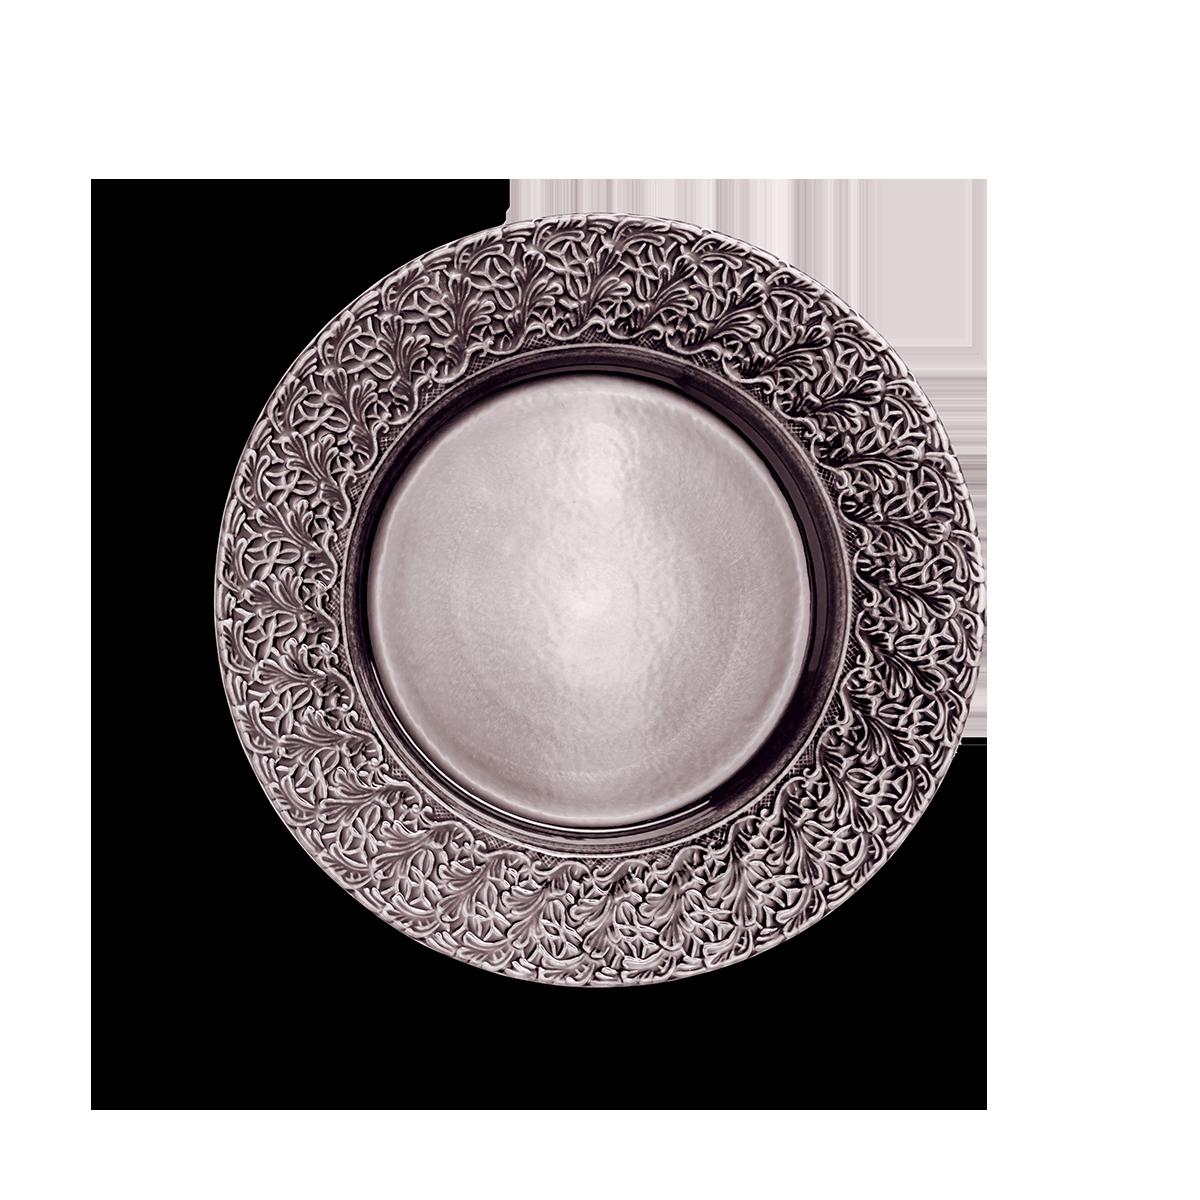 Spets Tallrik Plommon 32 cm